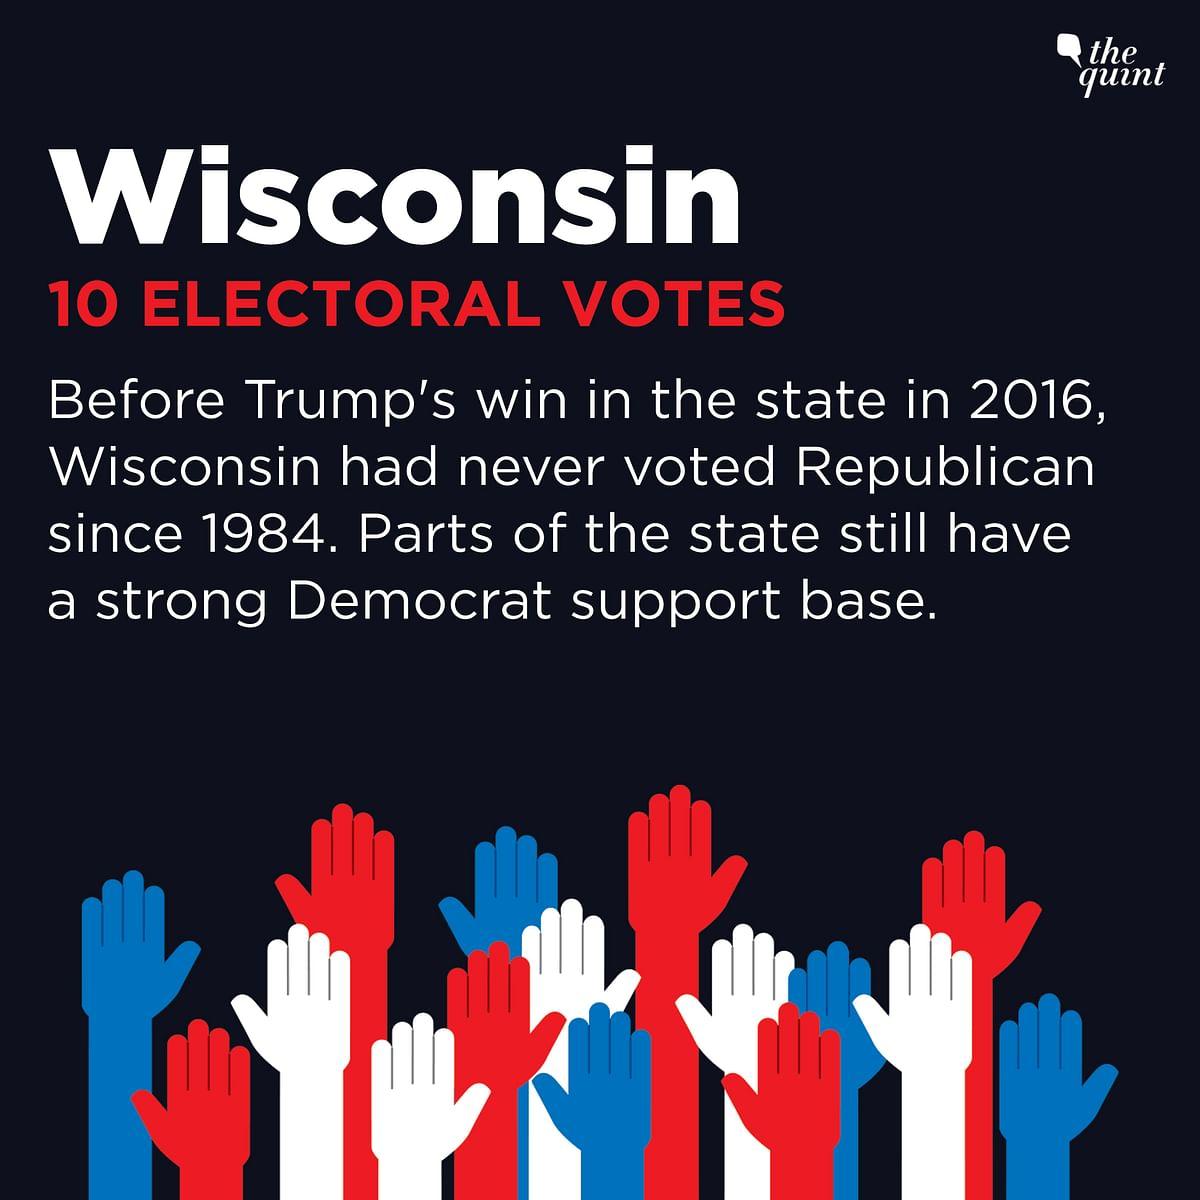 Biden Projected To Win Wisconsin, Trump Campaign To Seek Recount